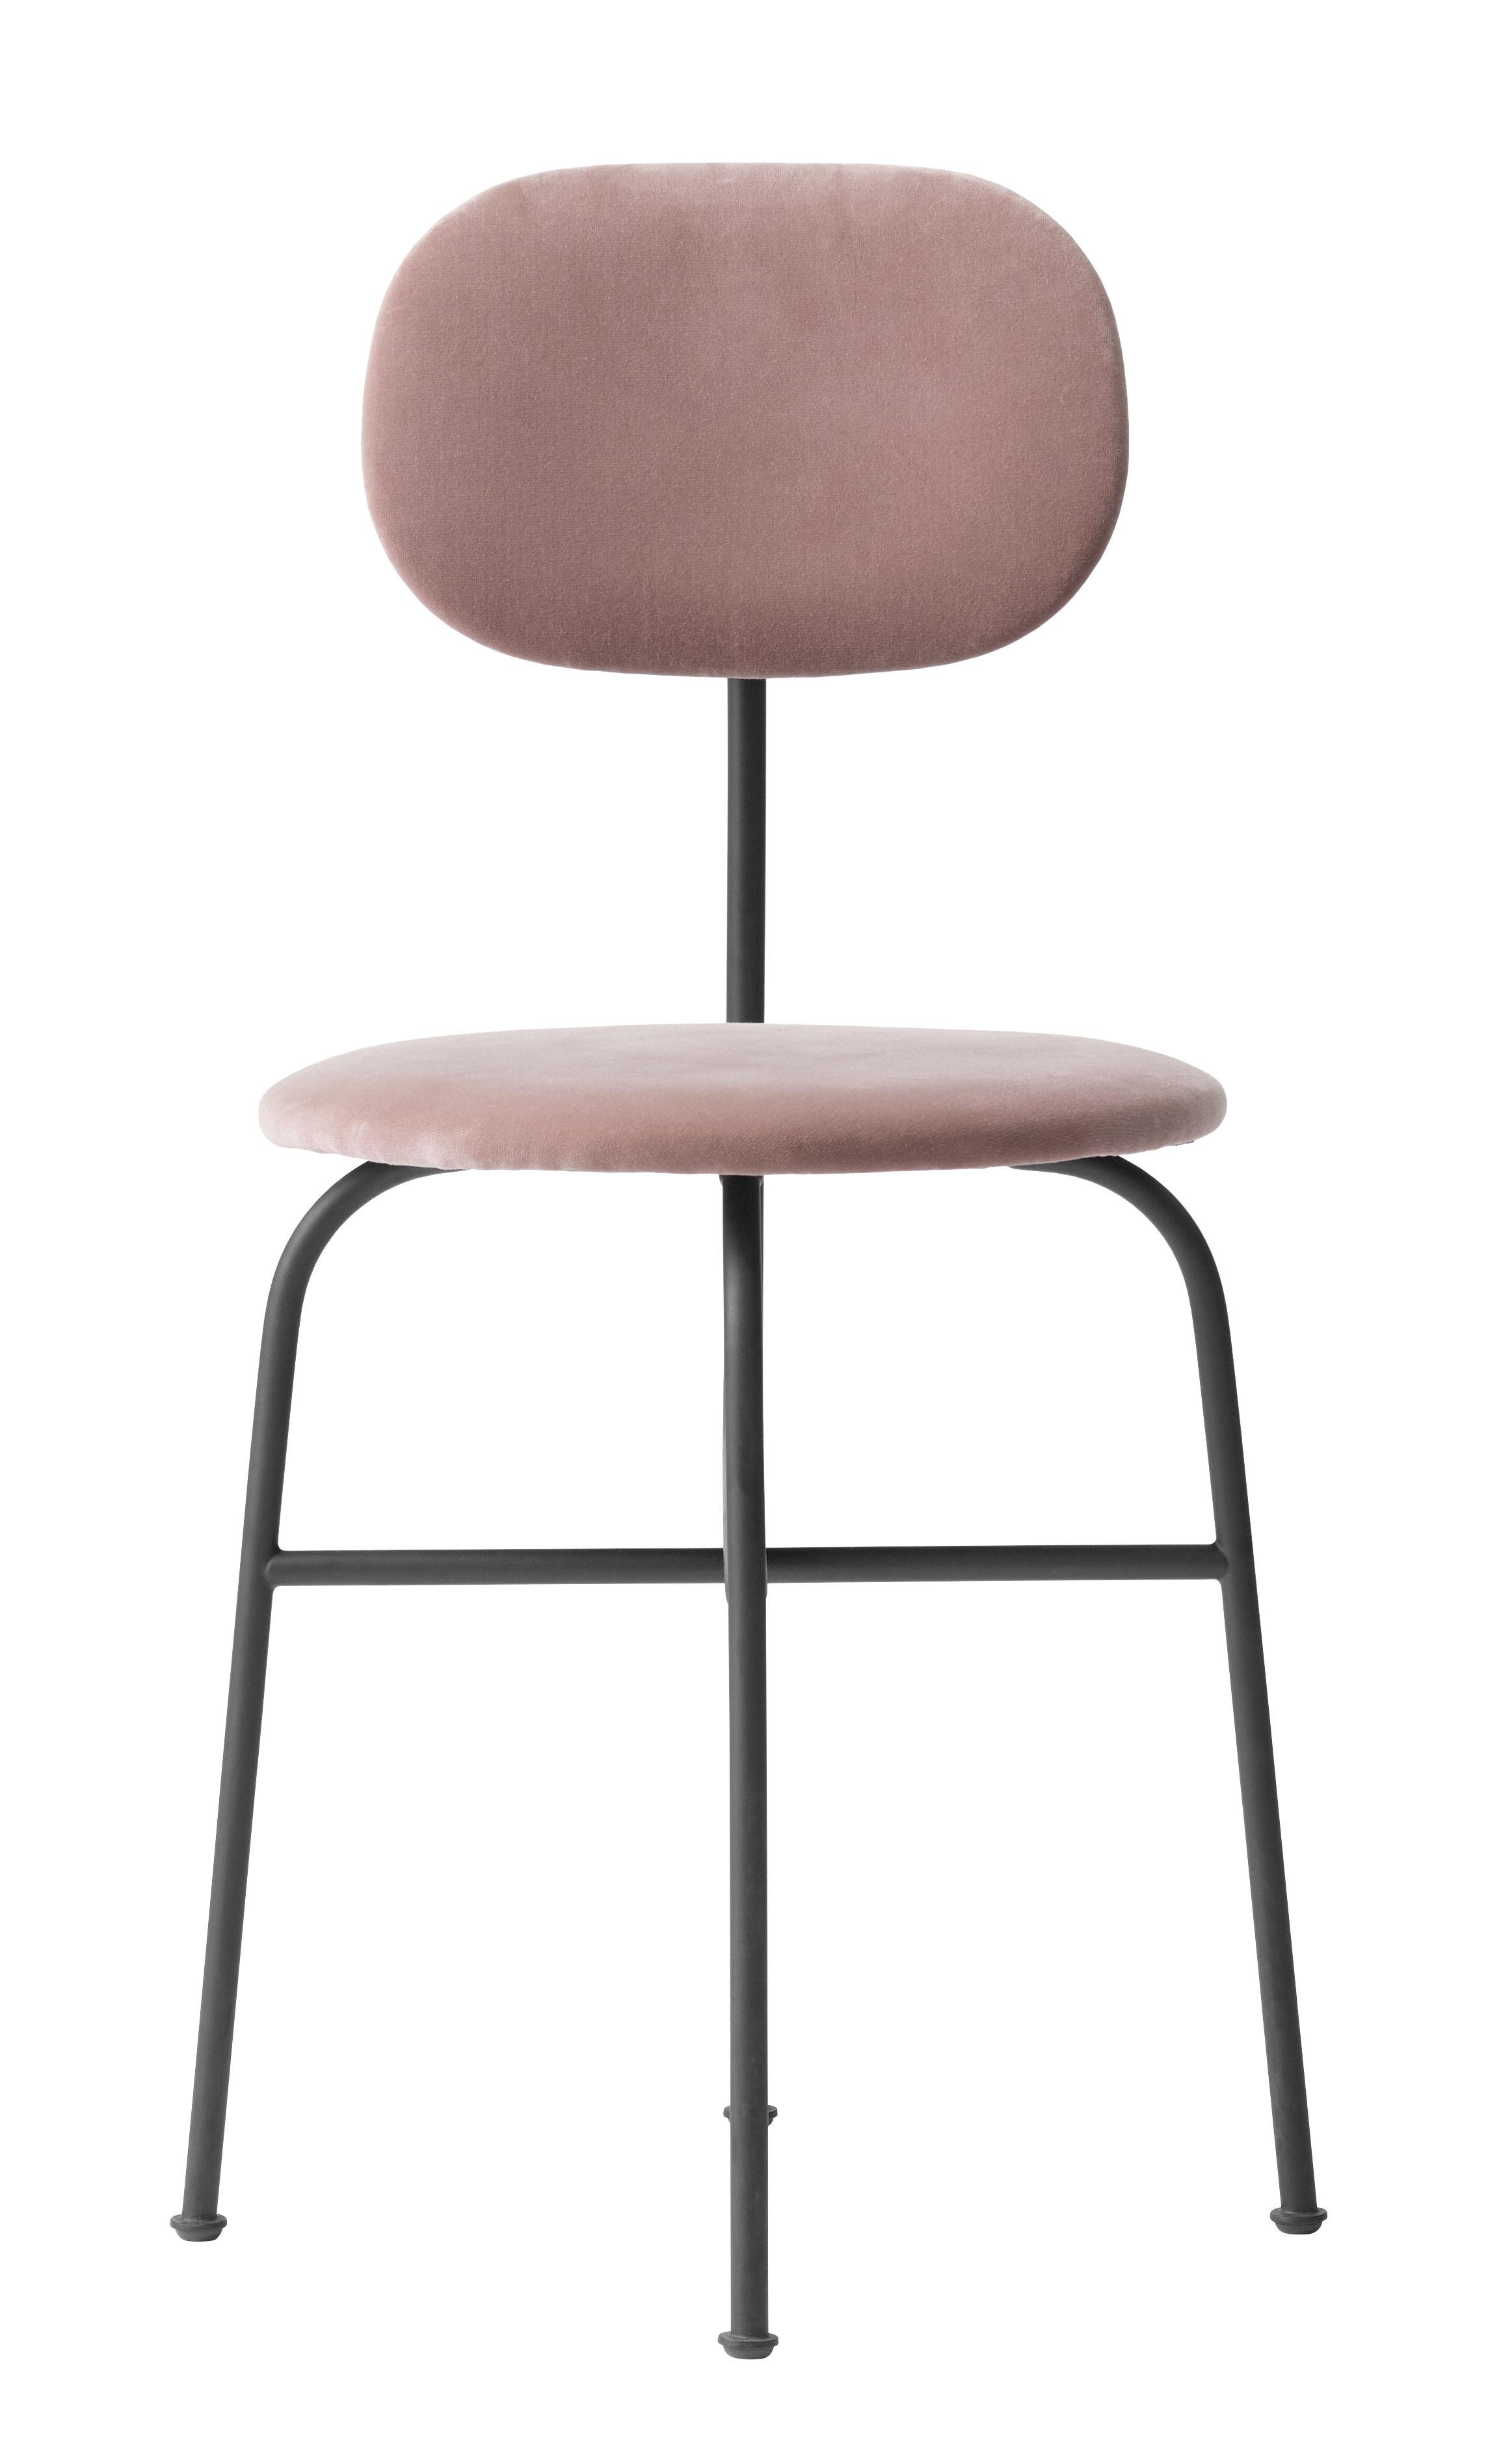 Furniture - Chairs - Afteroom Padded chair - / Velvet by Menu - Pink / Black velvet - Plywood, Powder steel, Velvet